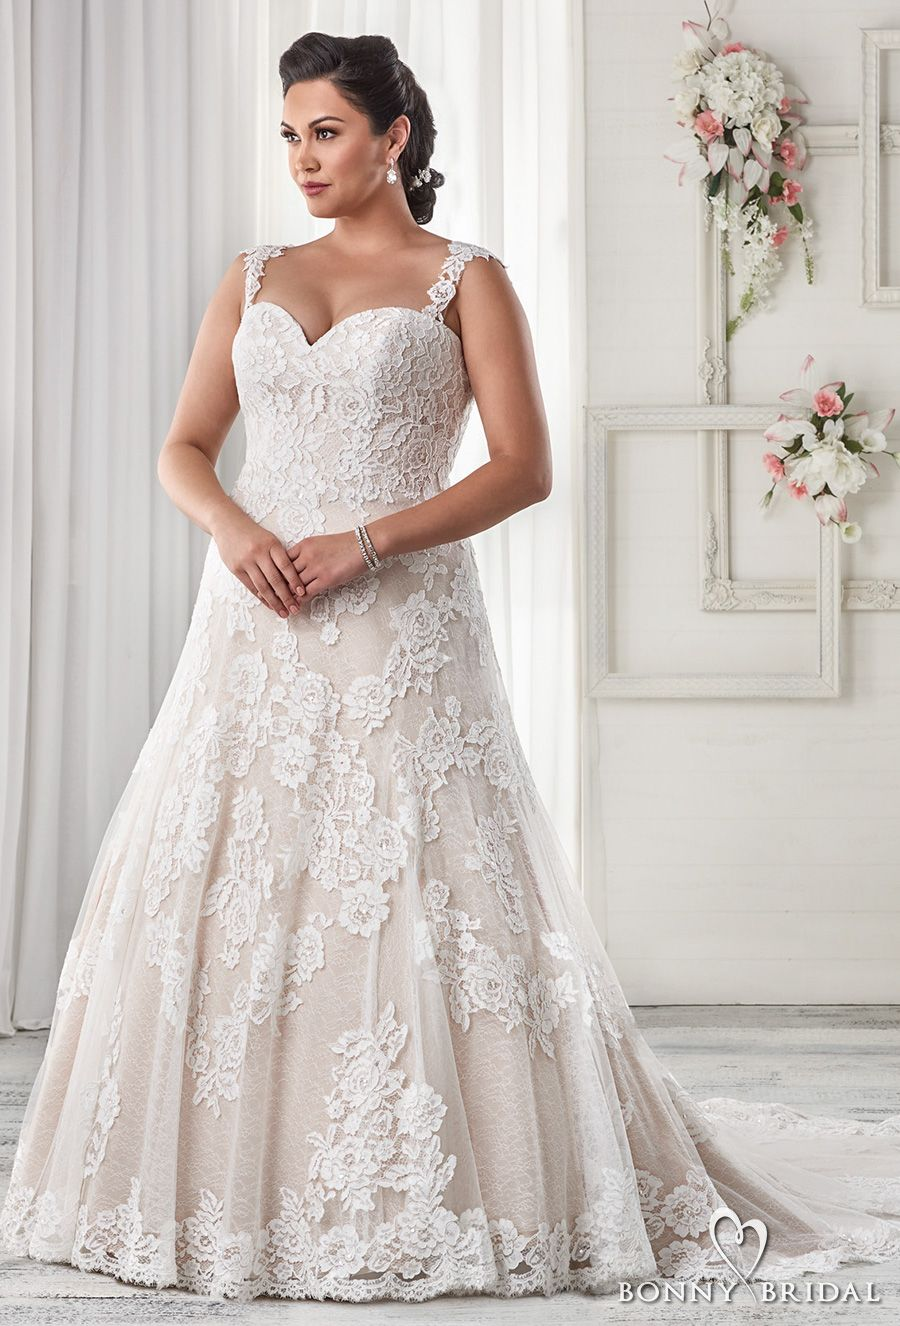 Bonny Bridal Wedding Dresses Unforgettable Styles For Every Bride Wedding Inspirasi Wedding Dress Necklines Wedding Dresses Beaded Wedding Dresses Lace